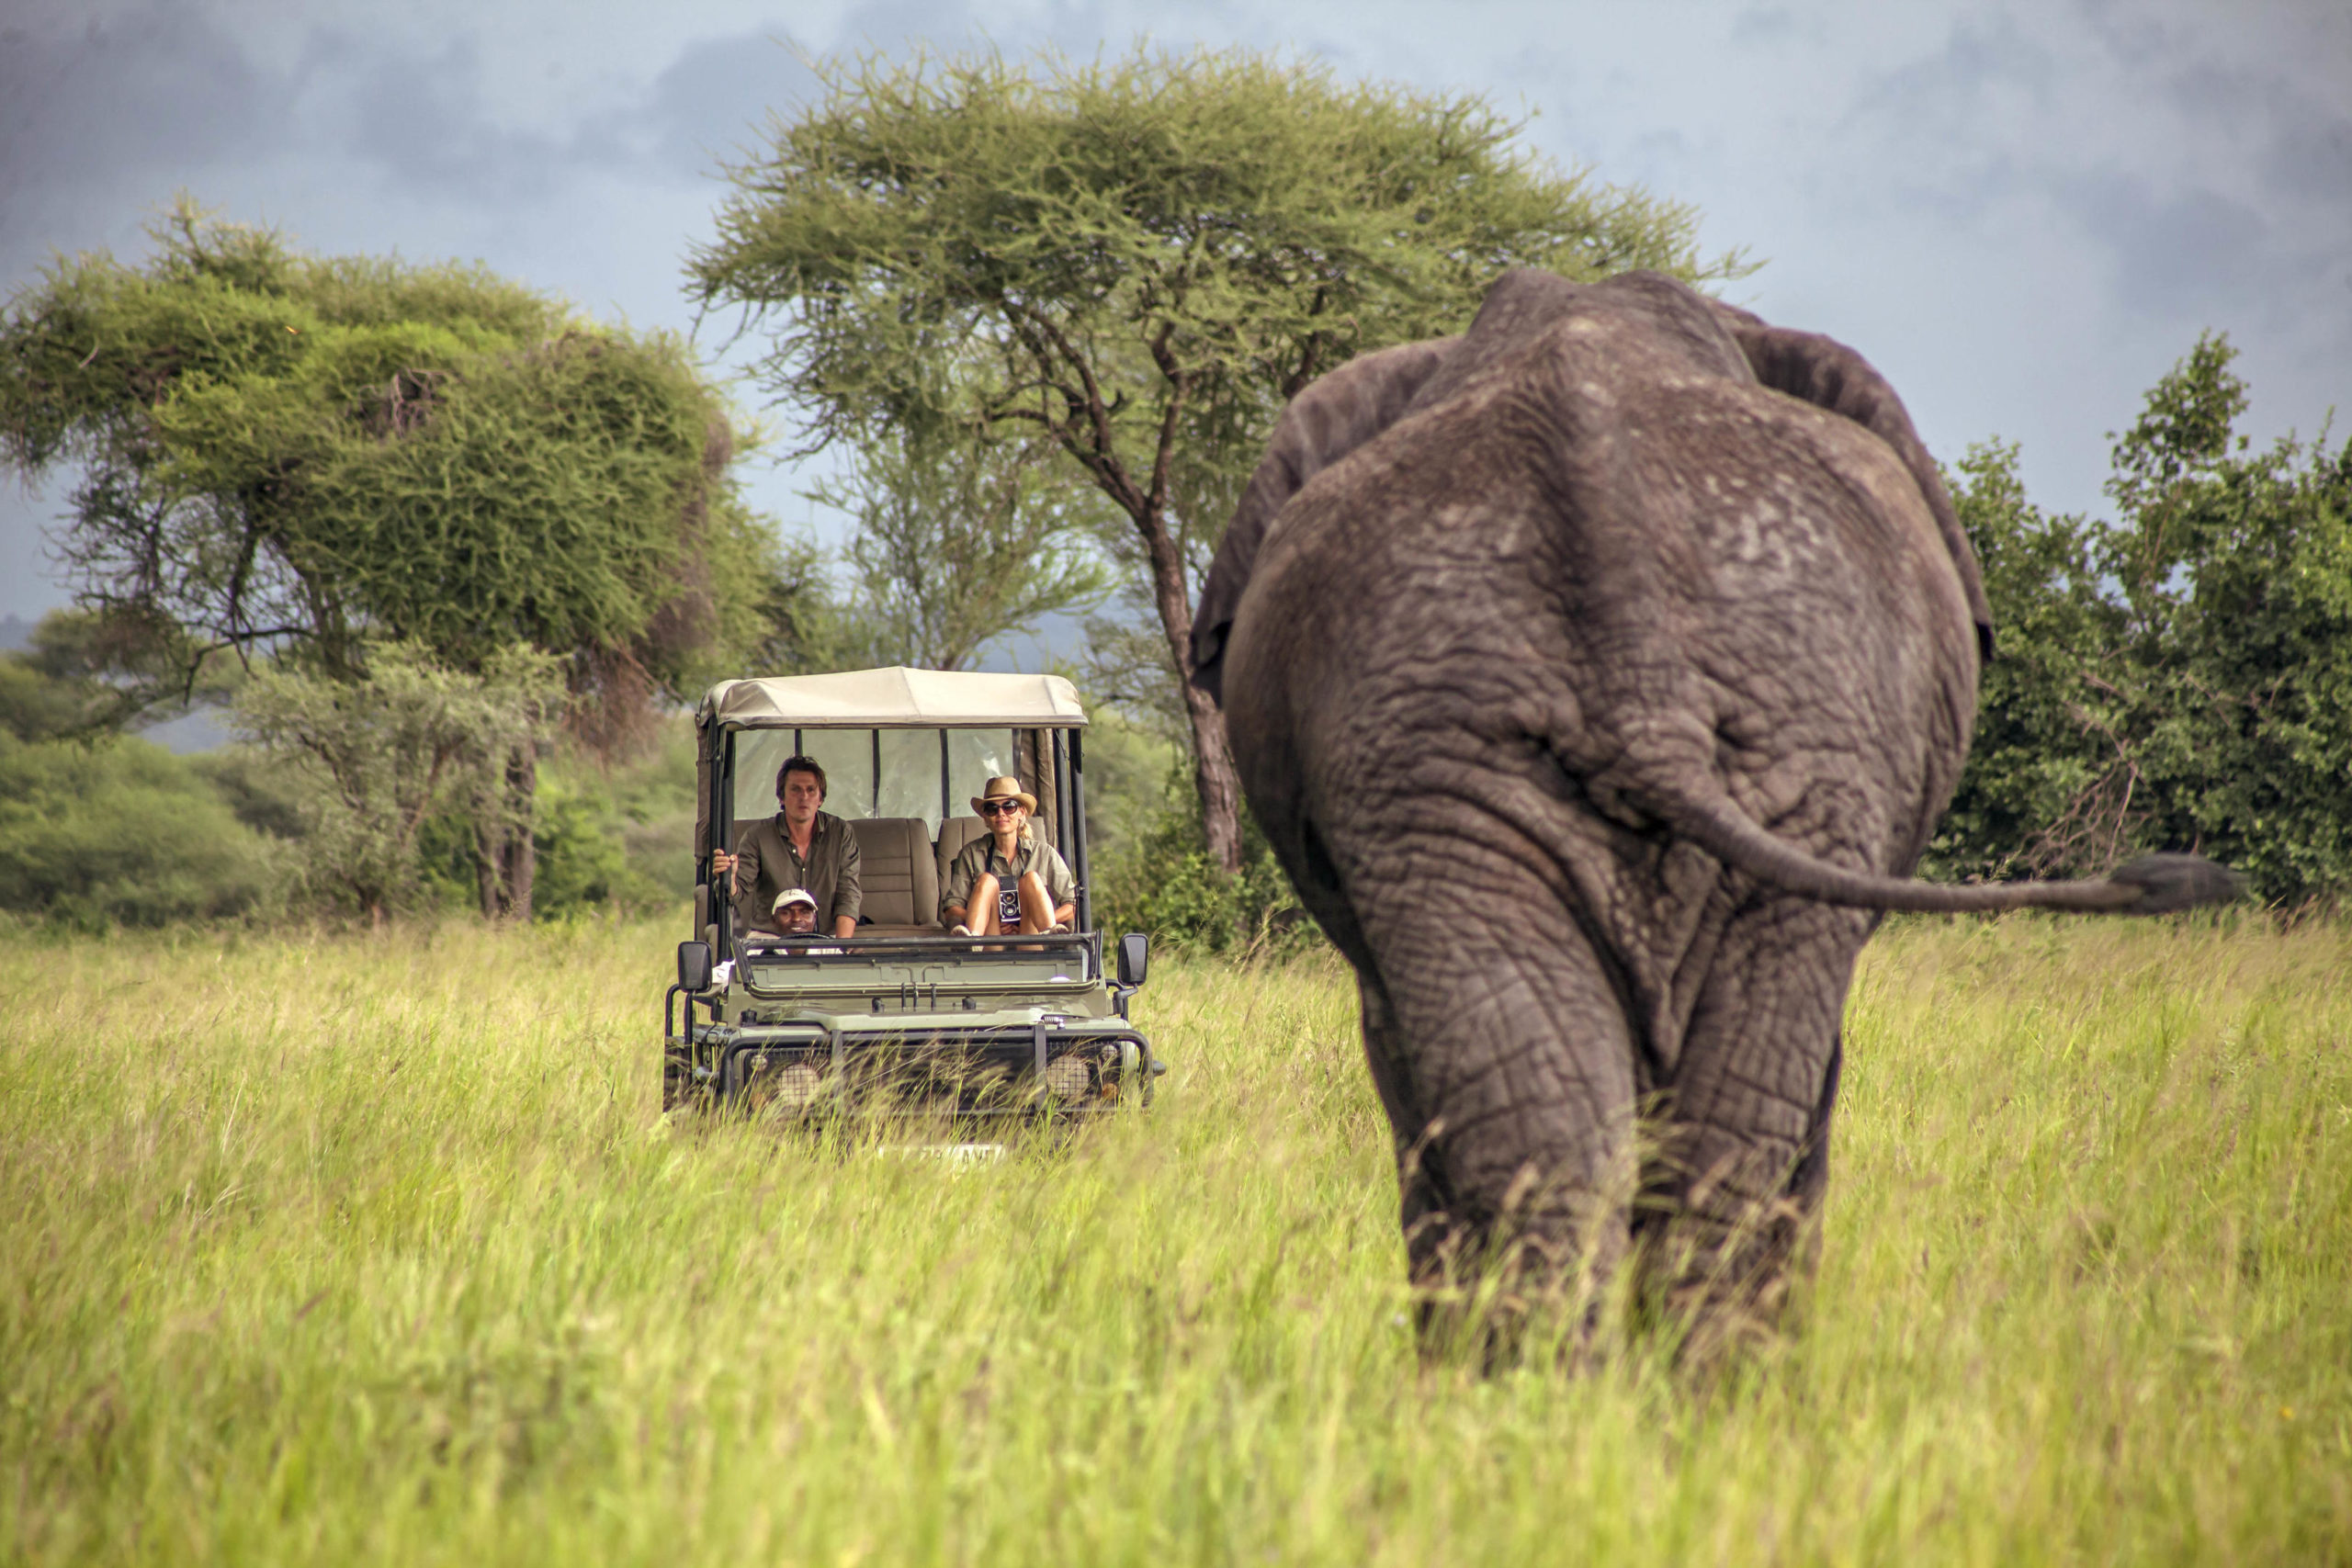 Elephant and Vehicle at Chem Chem